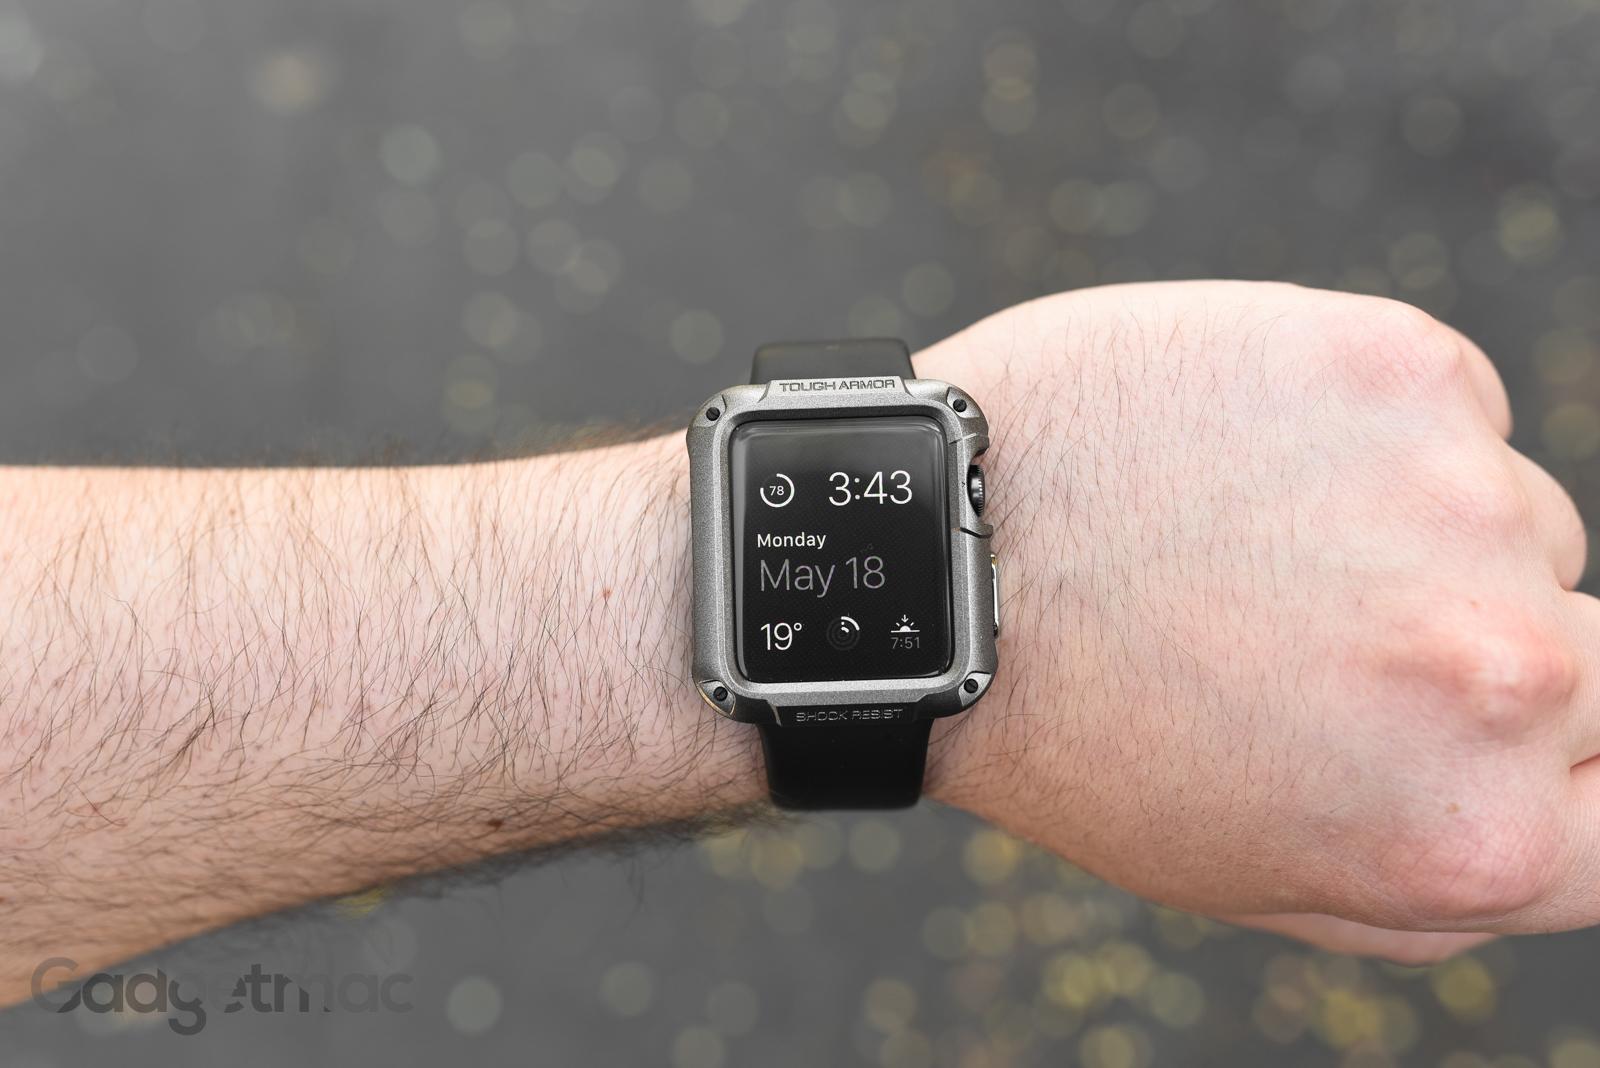 spigen-tough-armor-case-for-apple-watch.jpg